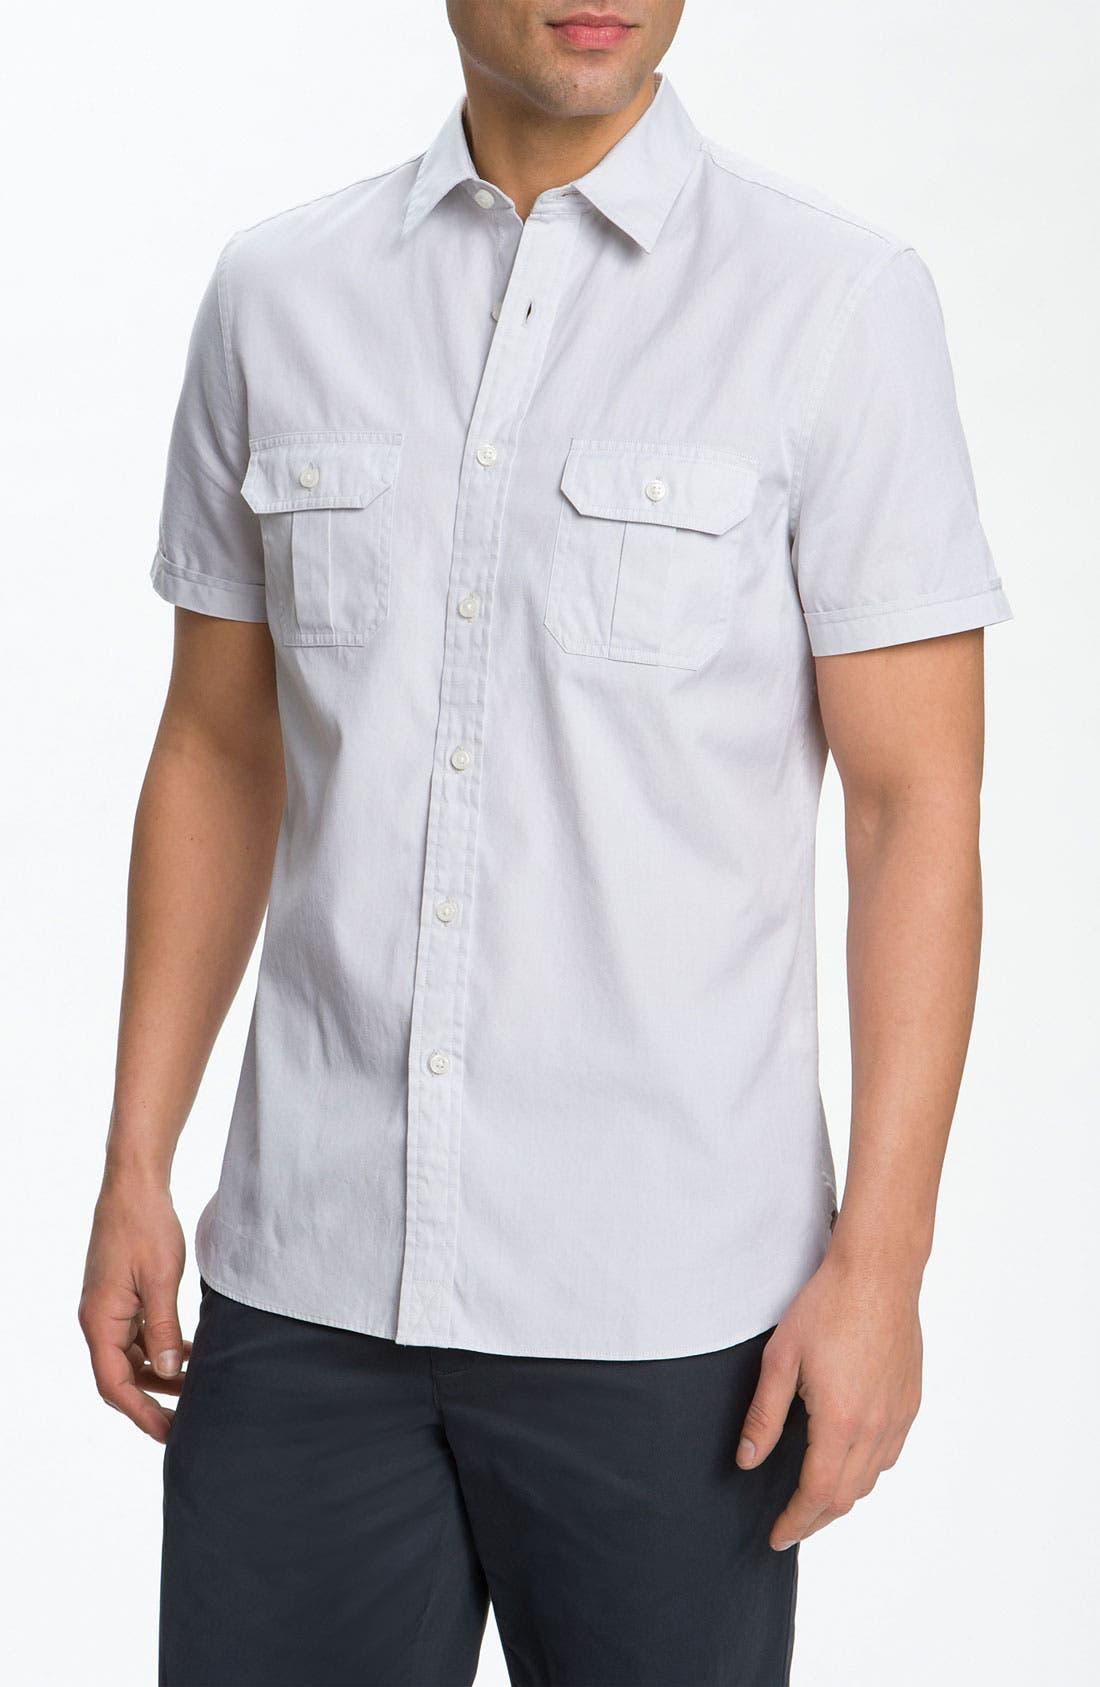 Main Image - Wallin & Bros. 'Richmond' Sport Shirt